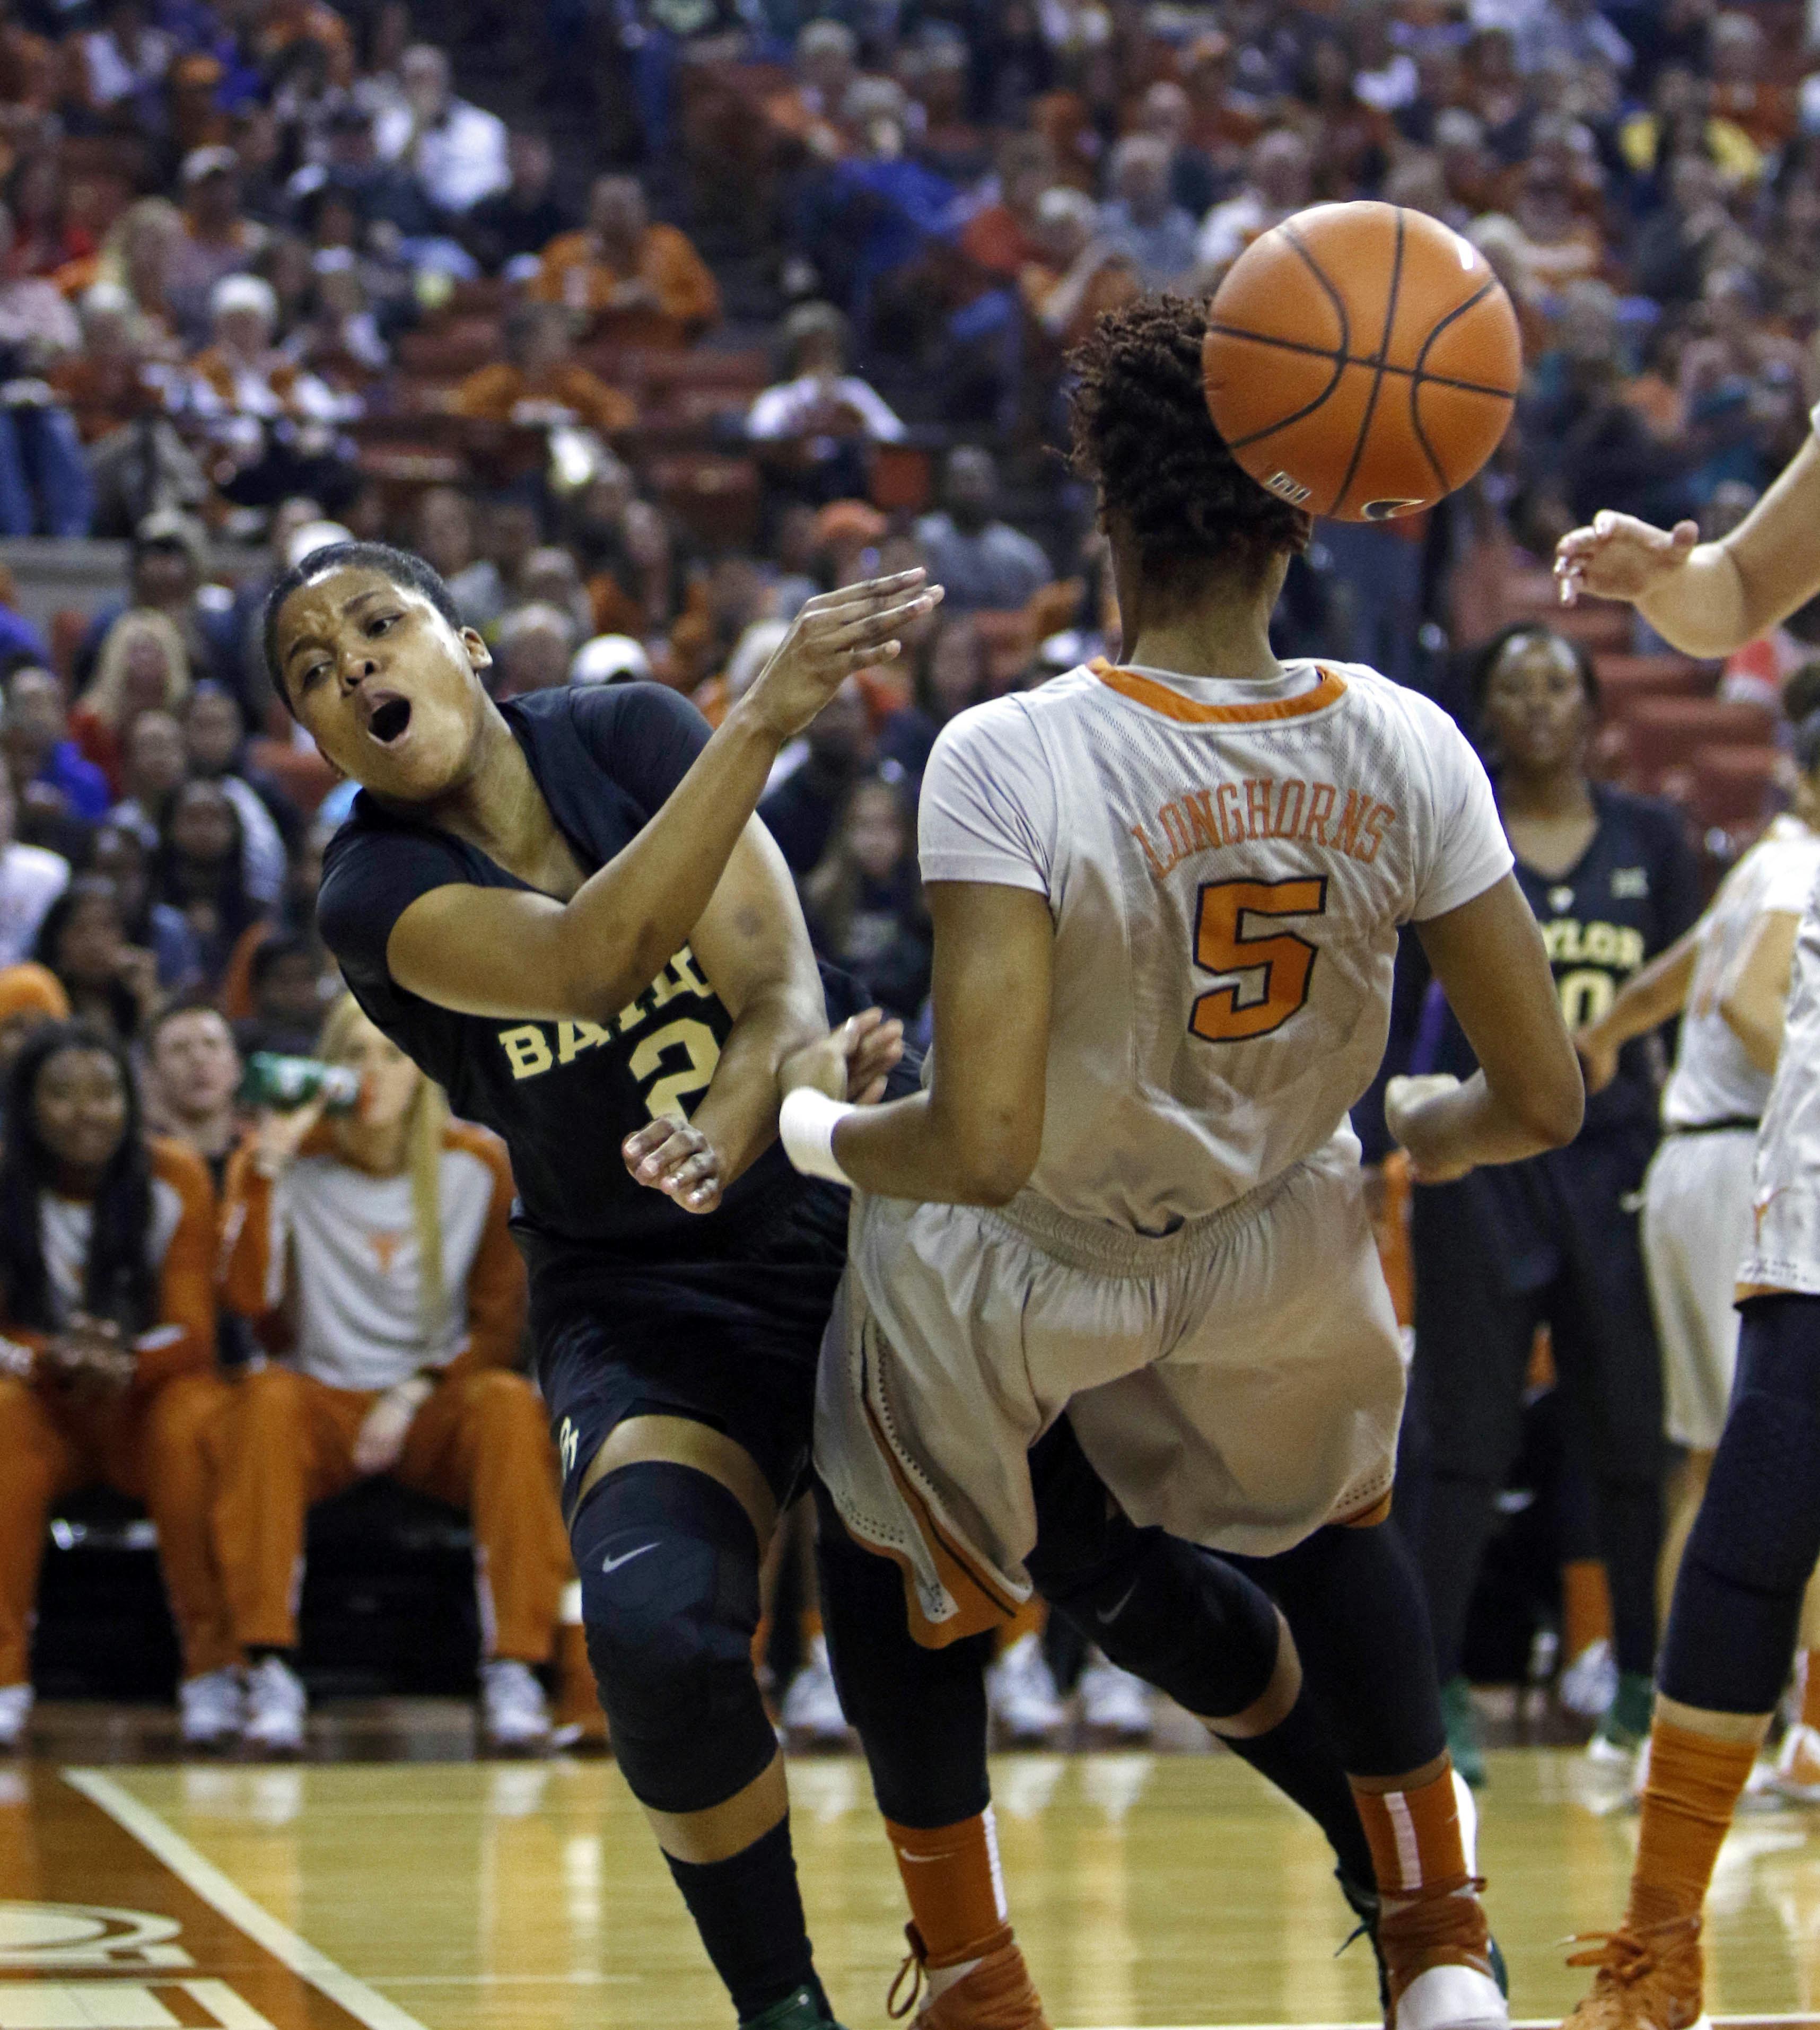 Baylor guard Niya Johnson (2) is fouled by Texas forward Jordan Hosey (5) during the first half of an NCAA college basketball game, Sunday, Jan. 17, 2016, in Austin, Texas. (AP Photo/Michael Thomas)